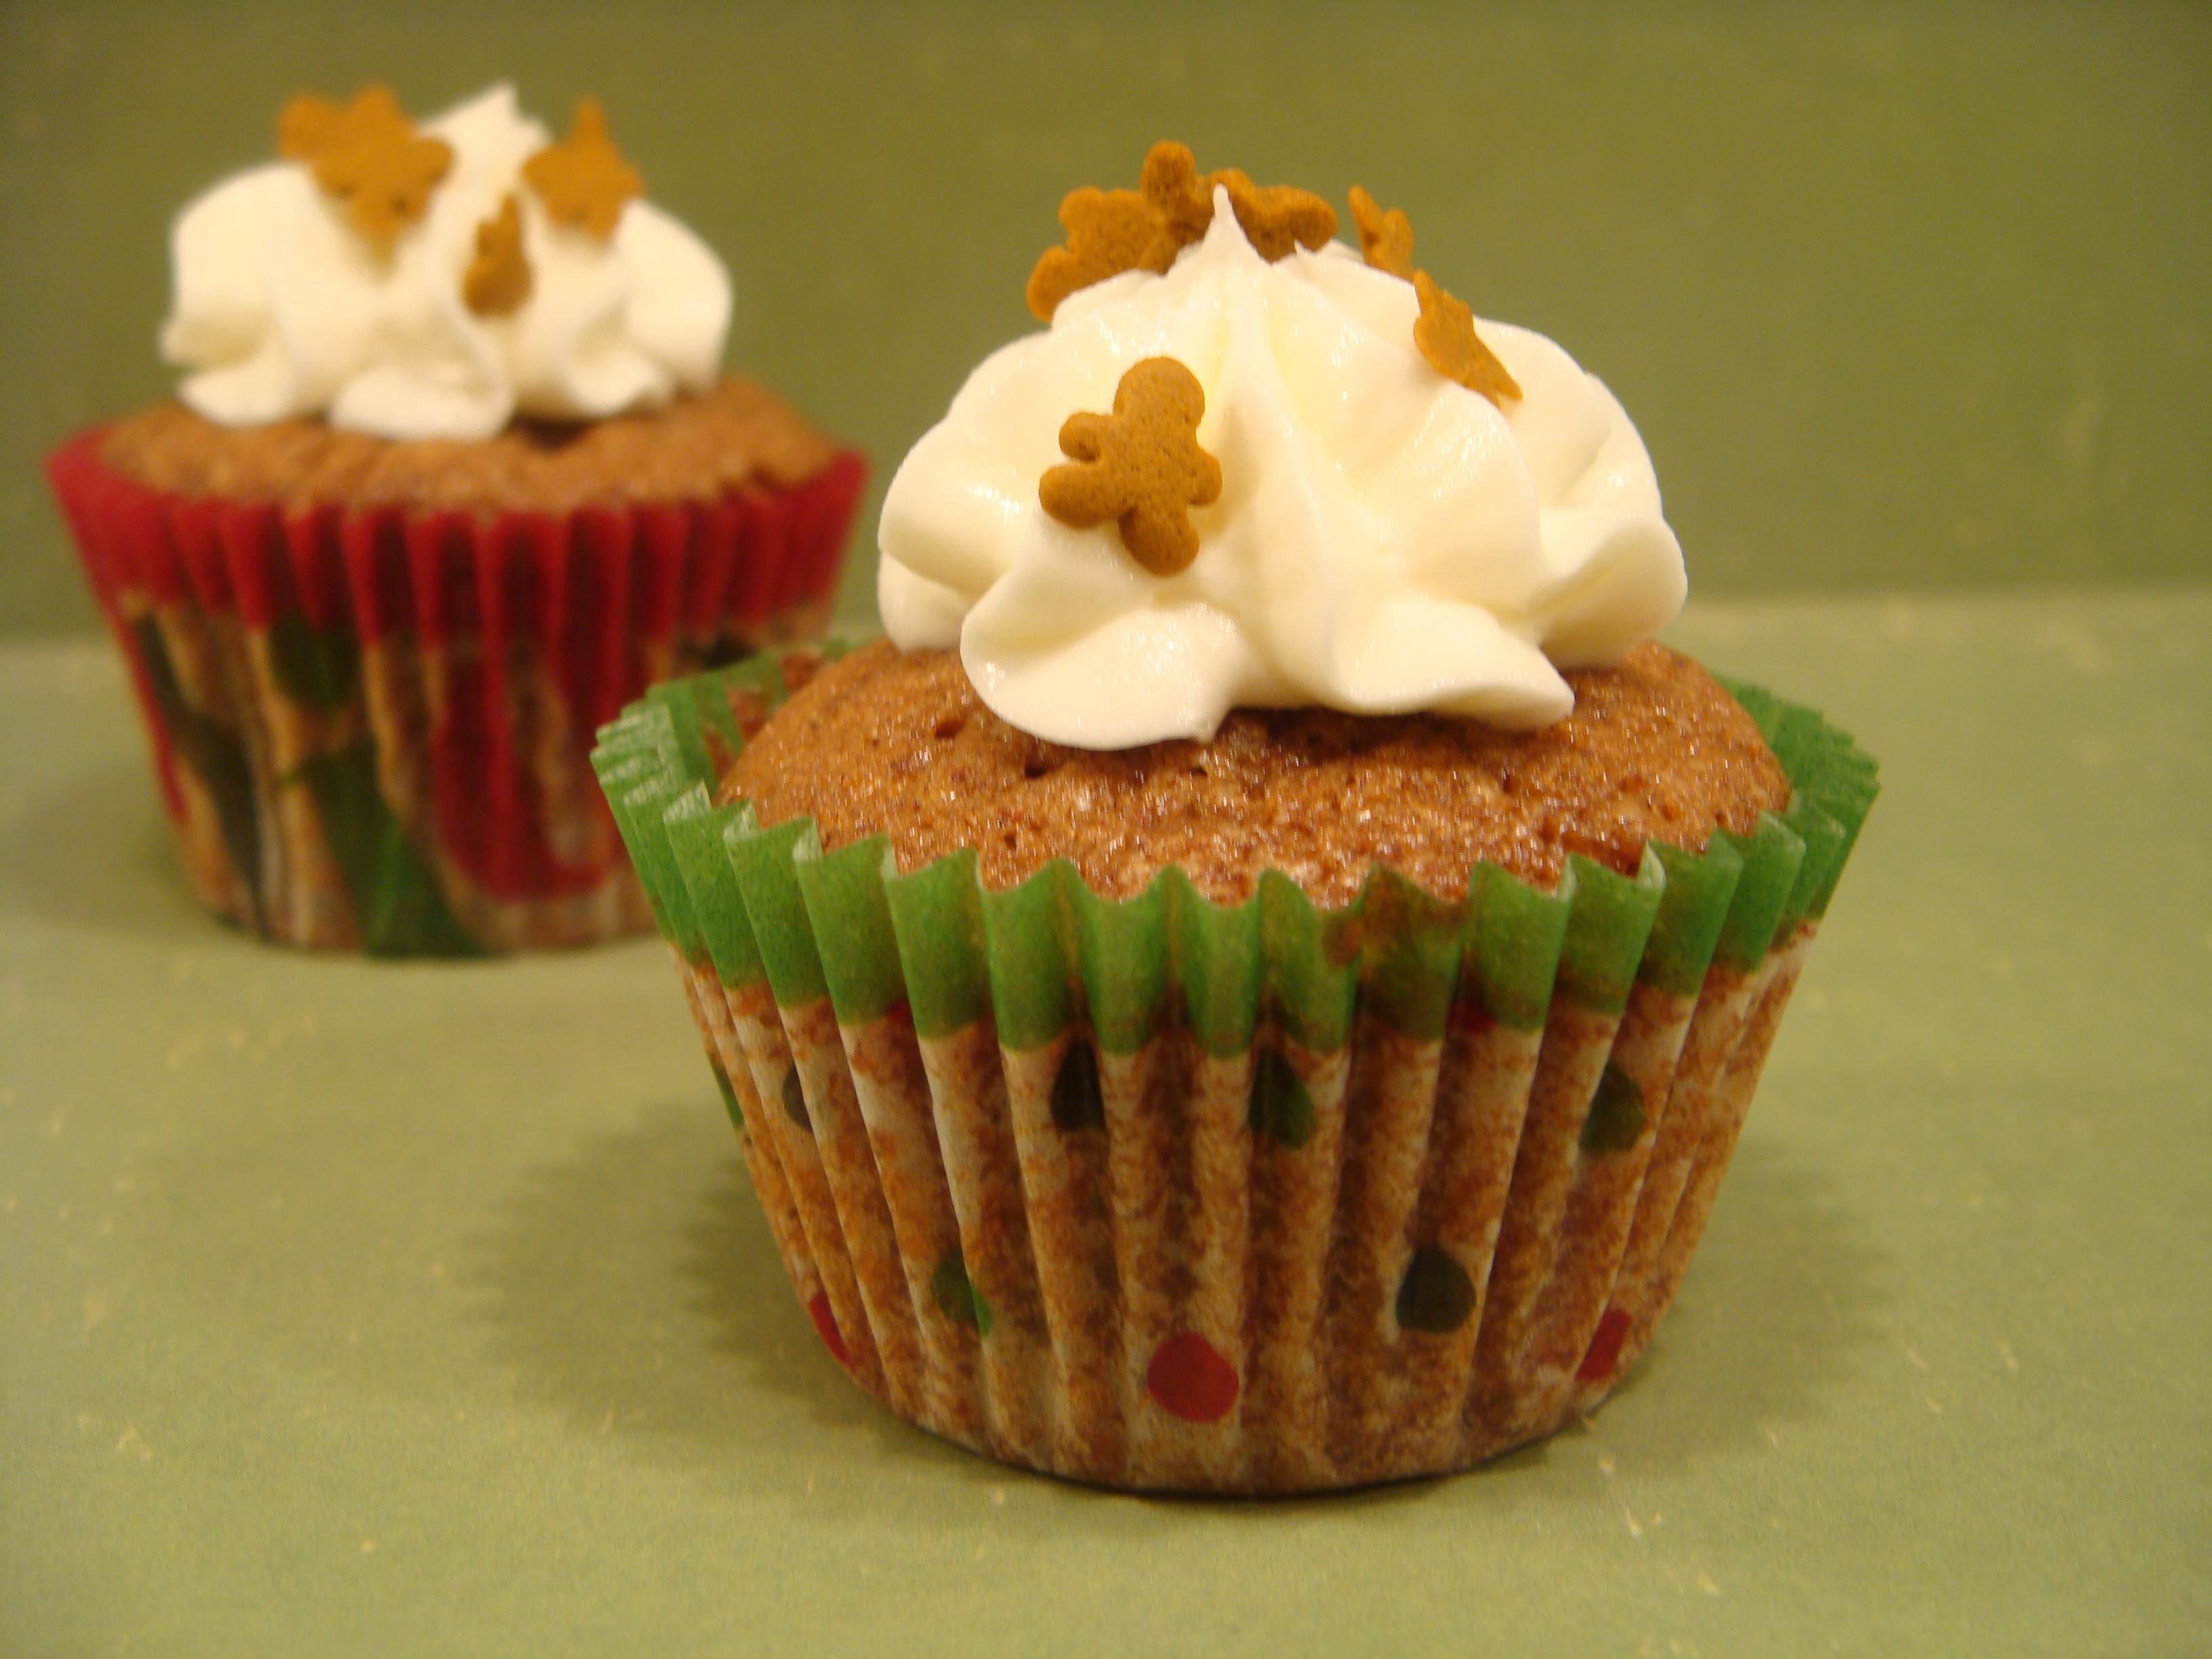 File:Two gingerbread mini cupcakes, December 2009.jpg - Wikimedia ...